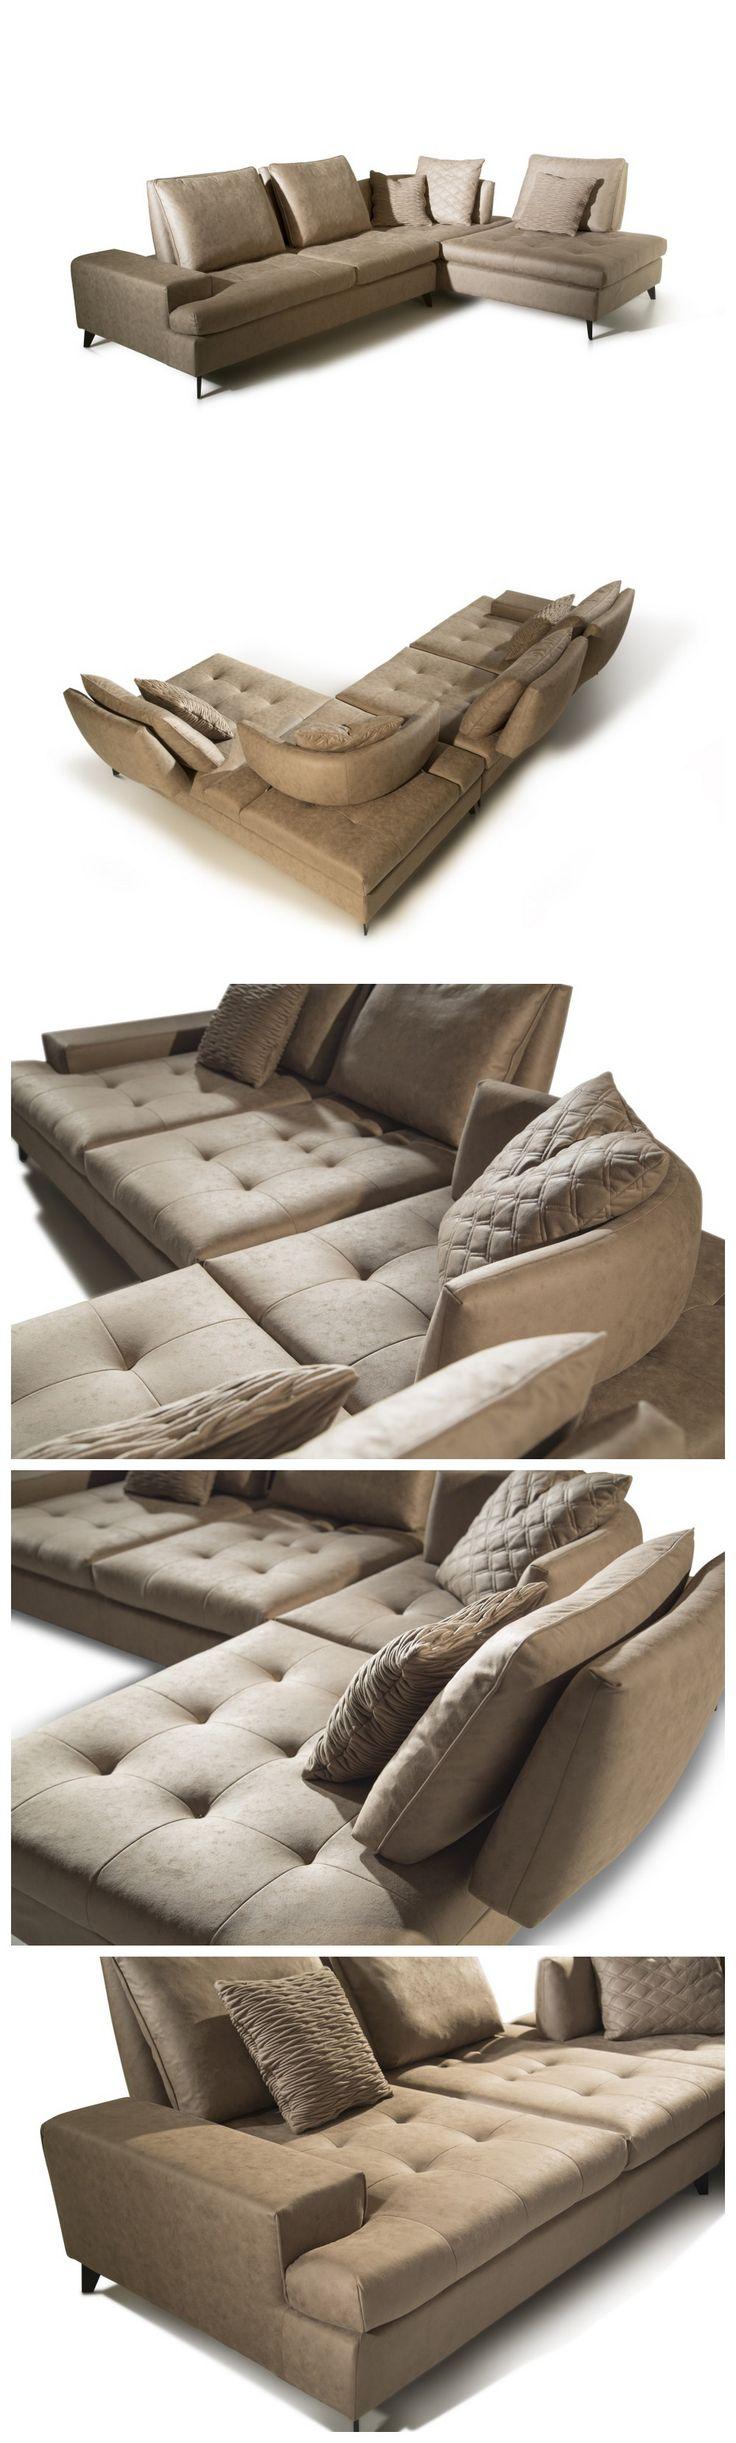 Best deals furniture living room sofa set design  new design modern sofa set #sofaset #sofa #cocheen #modernsofa #cocheendesign #livingroomsofa #furniture #newdesign #sectionalsofa #homefurniture #couch #furniturefactory  contact:jennifer@cocheen.com  online store link: cocheenfurniture.en.alibaba.com